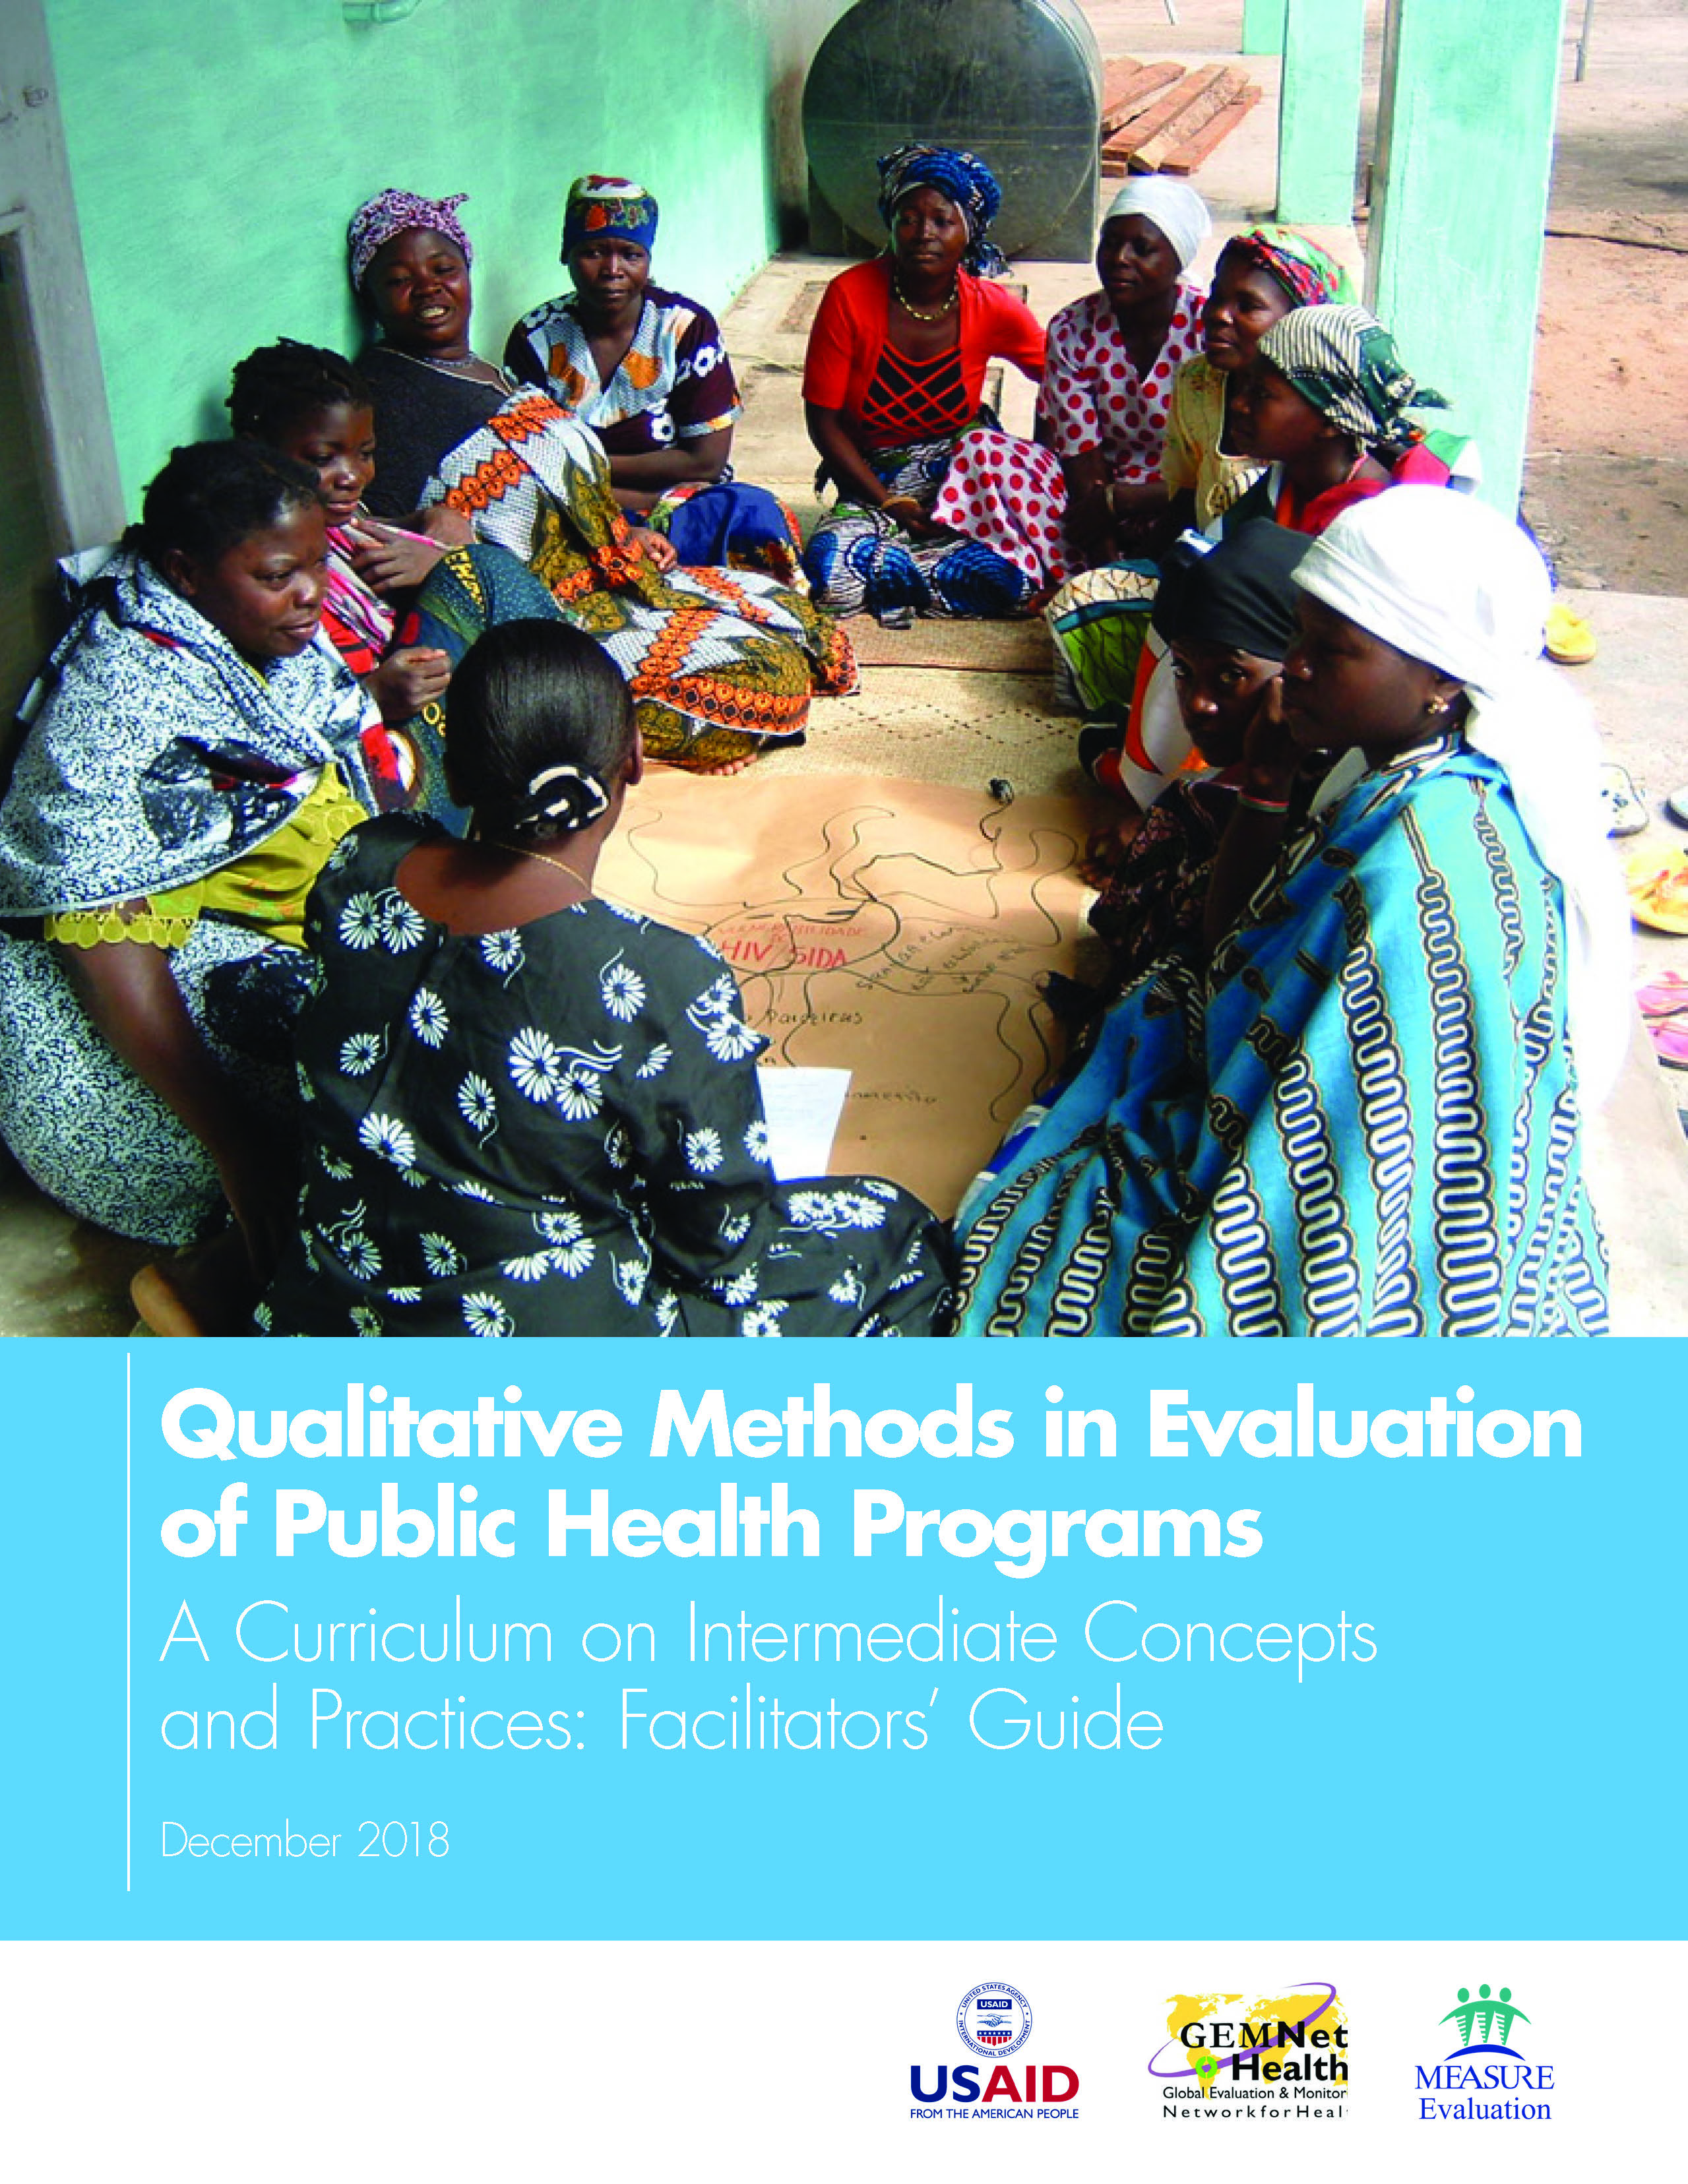 Qualitative Methods in Evaluation of Public Health Programs